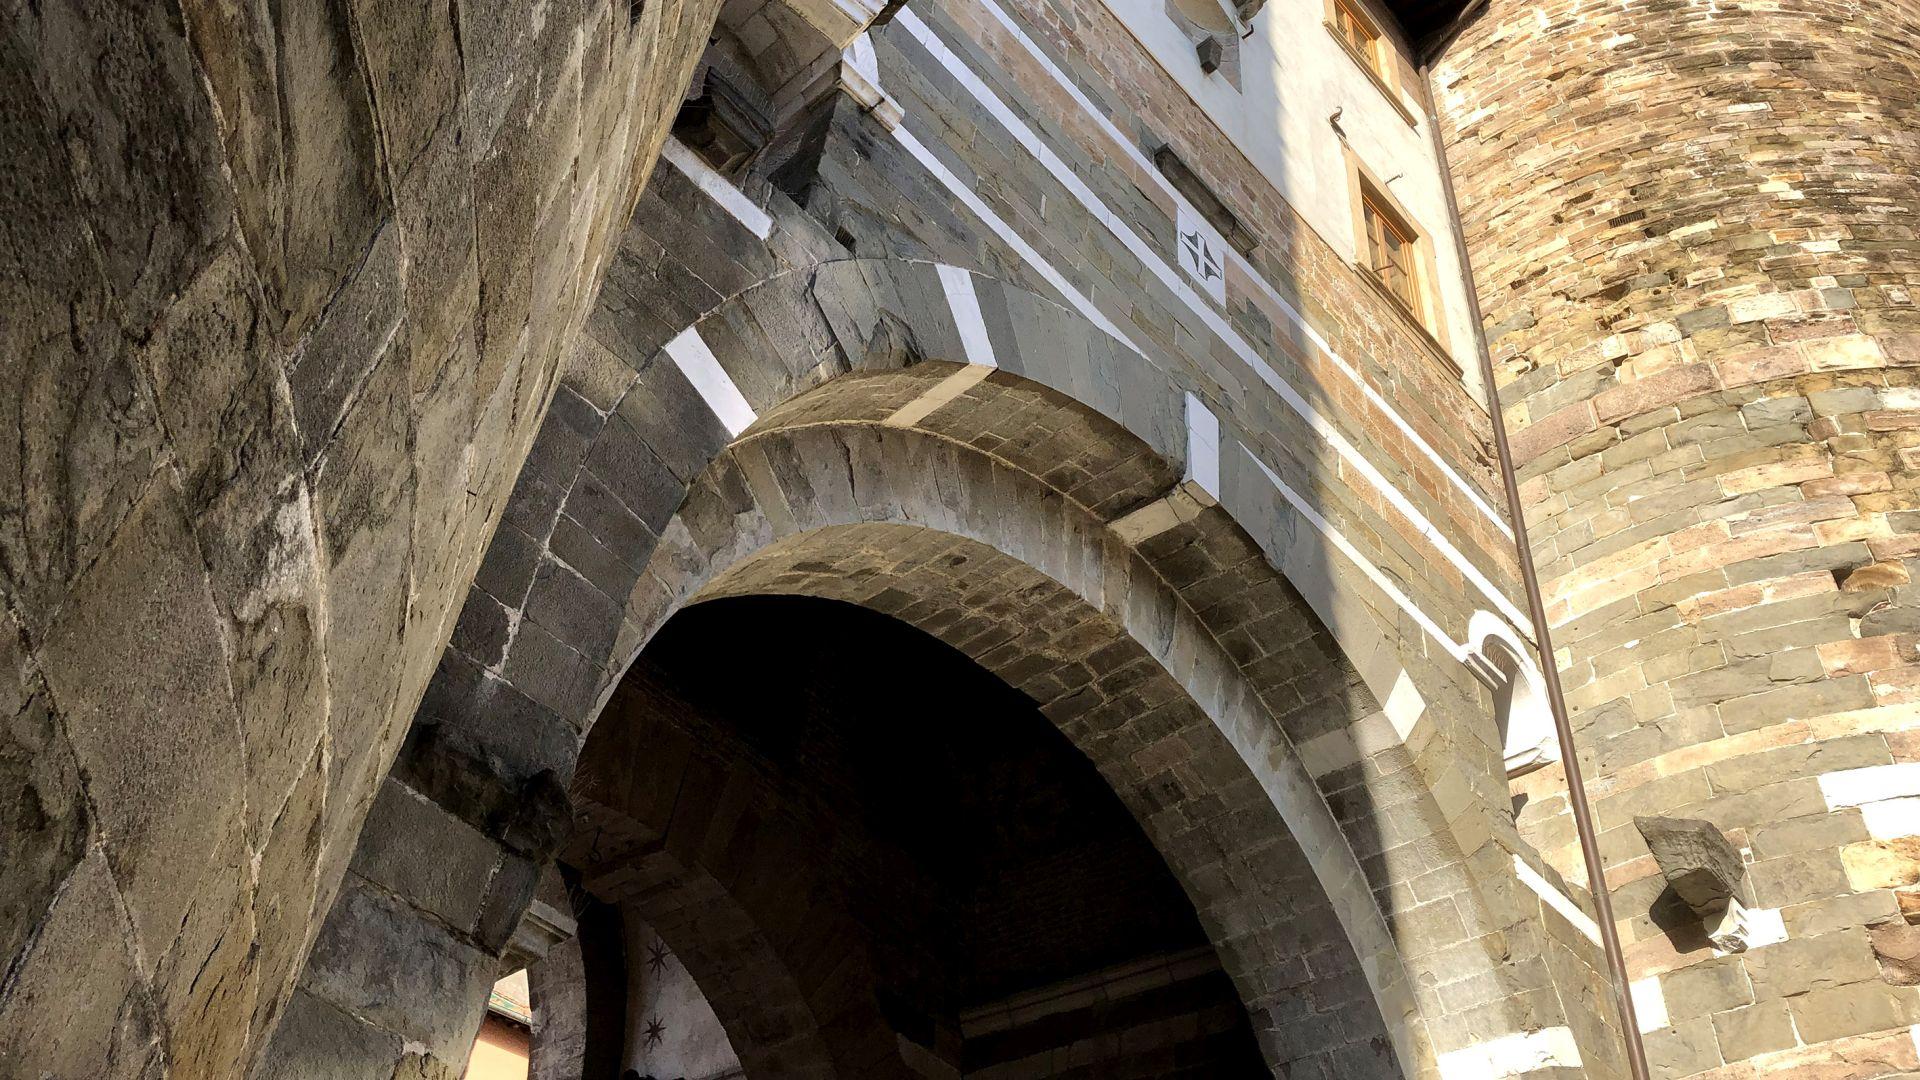 porta san Gervasio delle mura medievali di Lucca